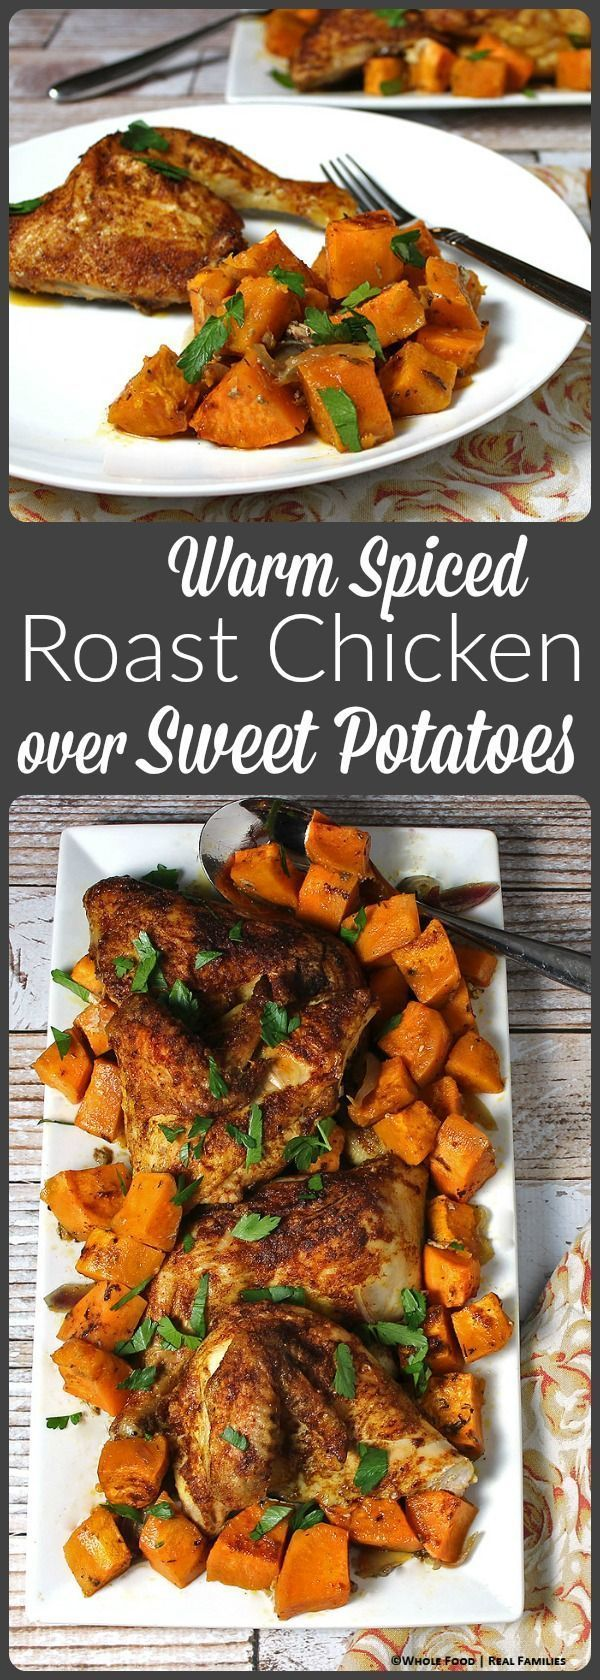 Warm Spiced Roast Chicken over Sweet Potatoes